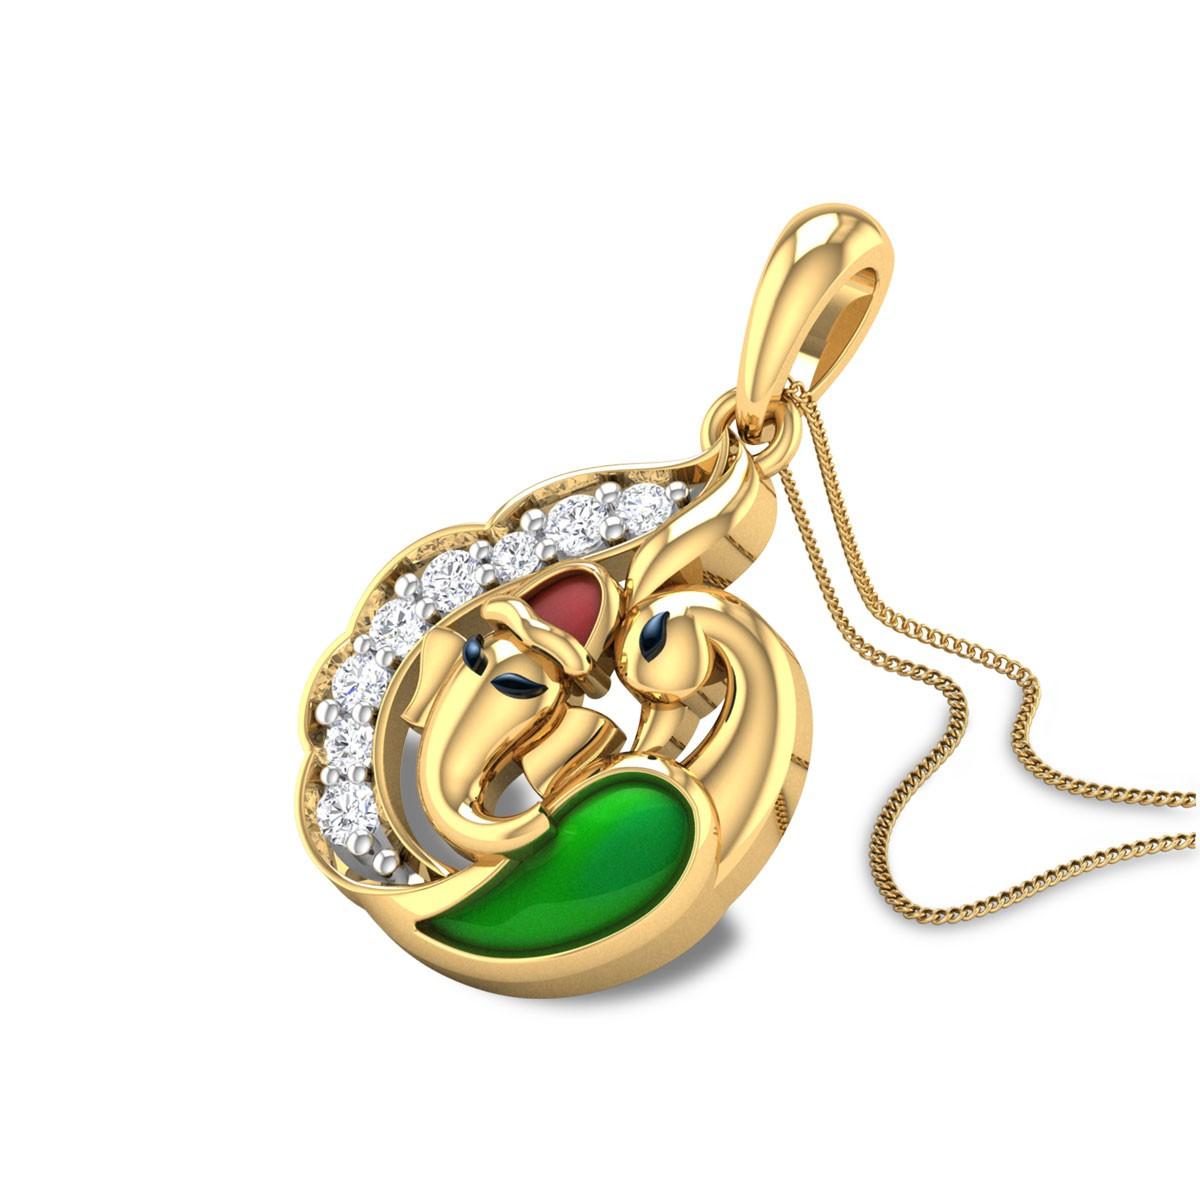 Peacock Vighnahara Diamond Pendant